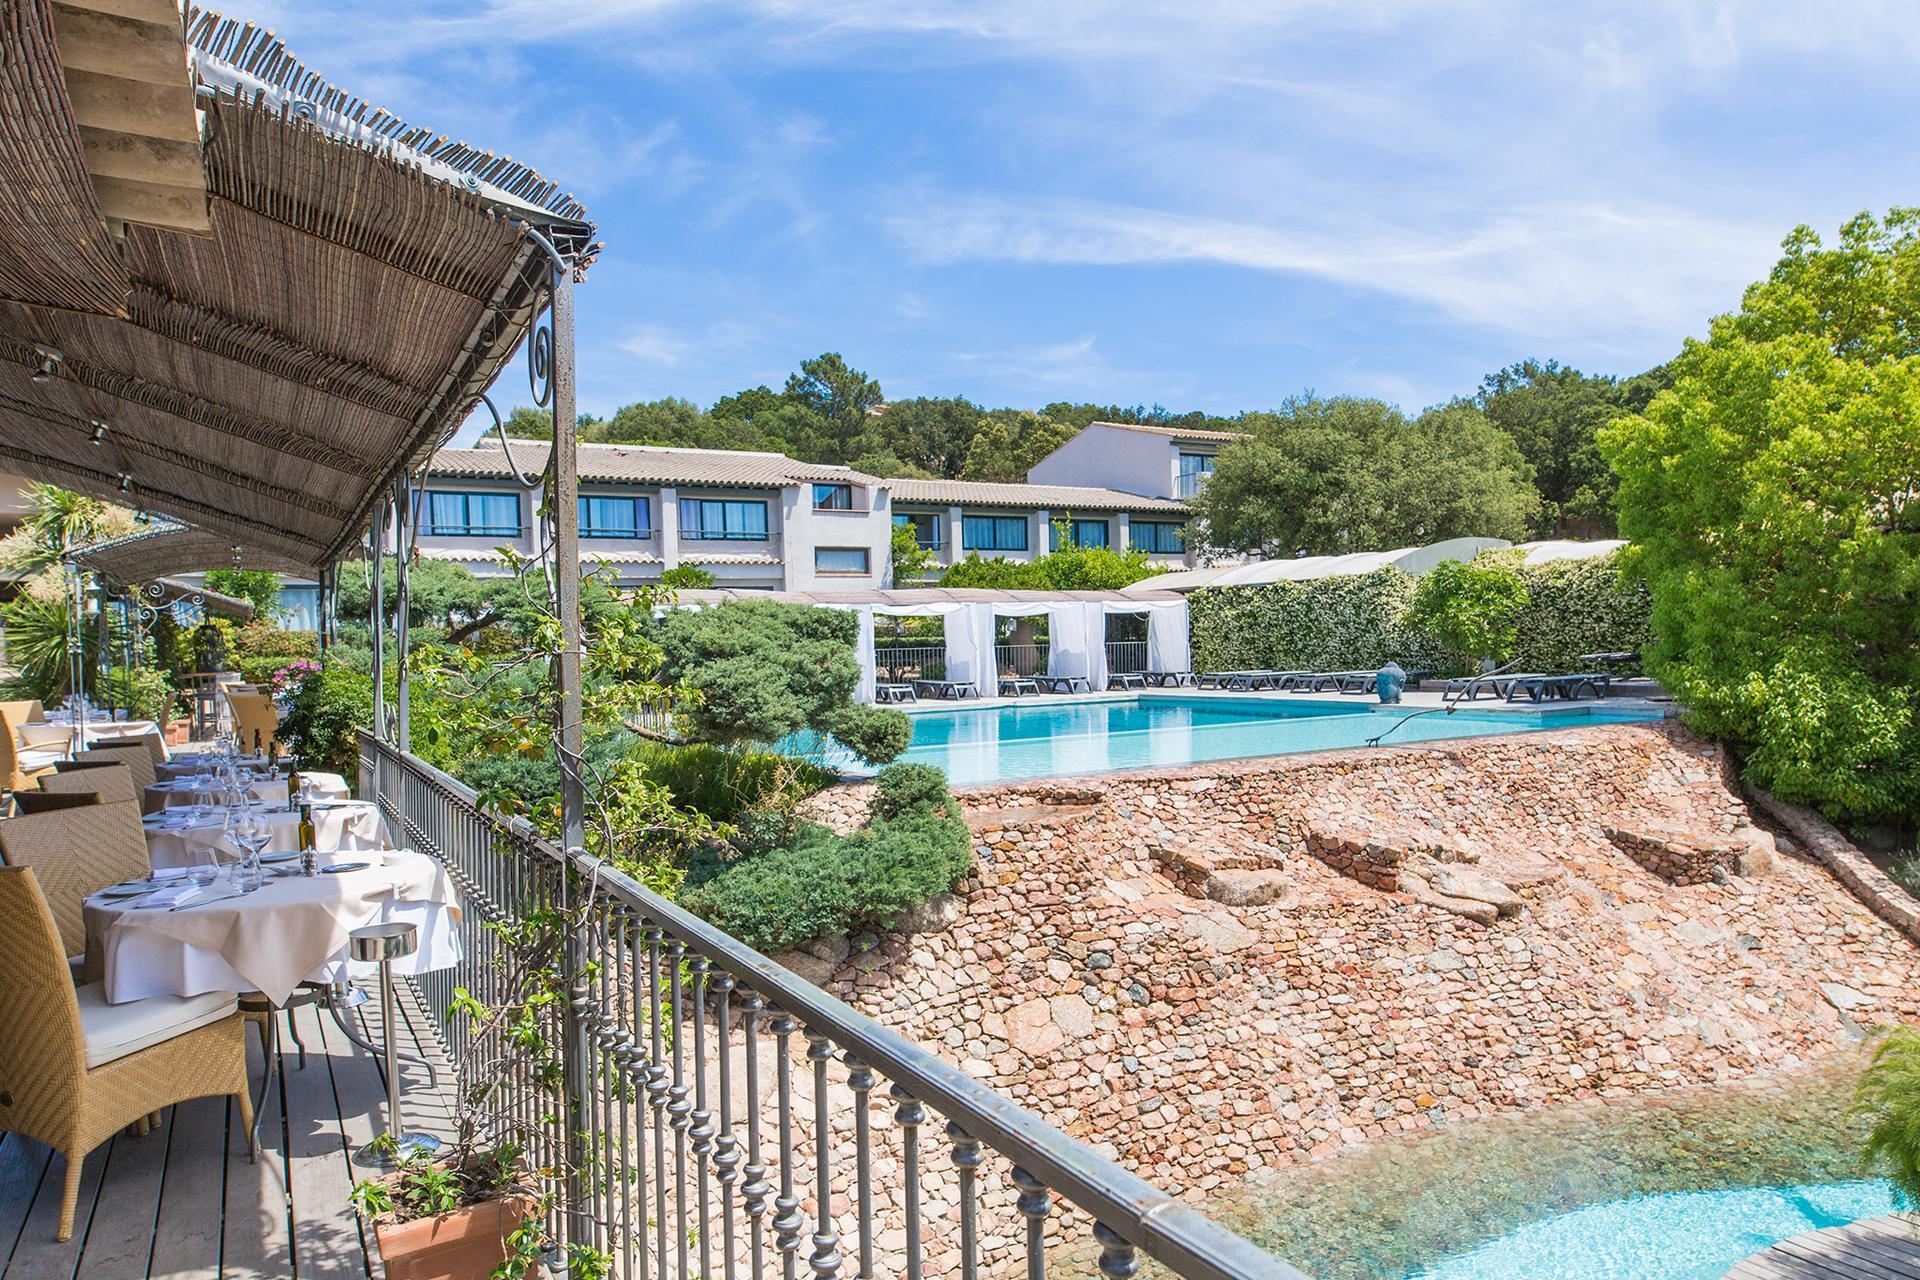 hotel-roi-theodore-et-spa-porto-vecchio-seminaires-de-caractere-restaurant (3)